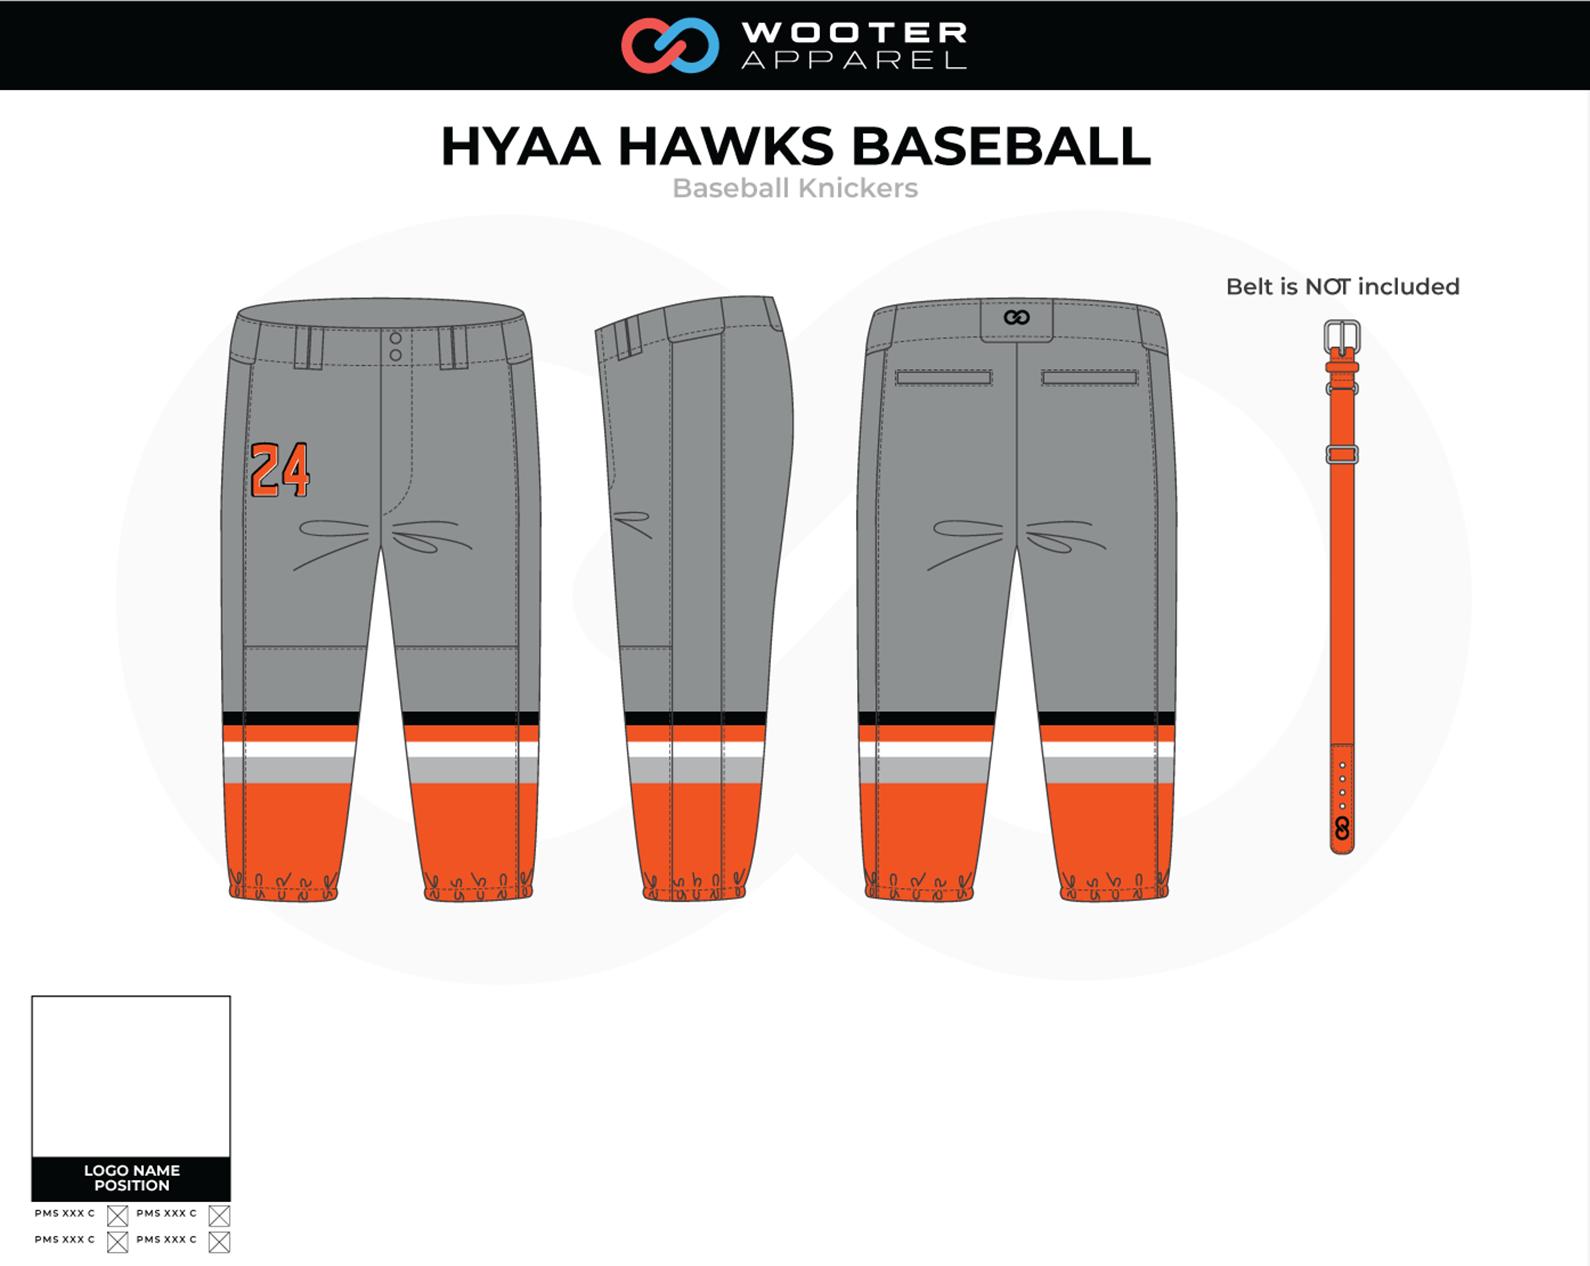 HYAAHawksBaseball_KnickerMockupV1.png